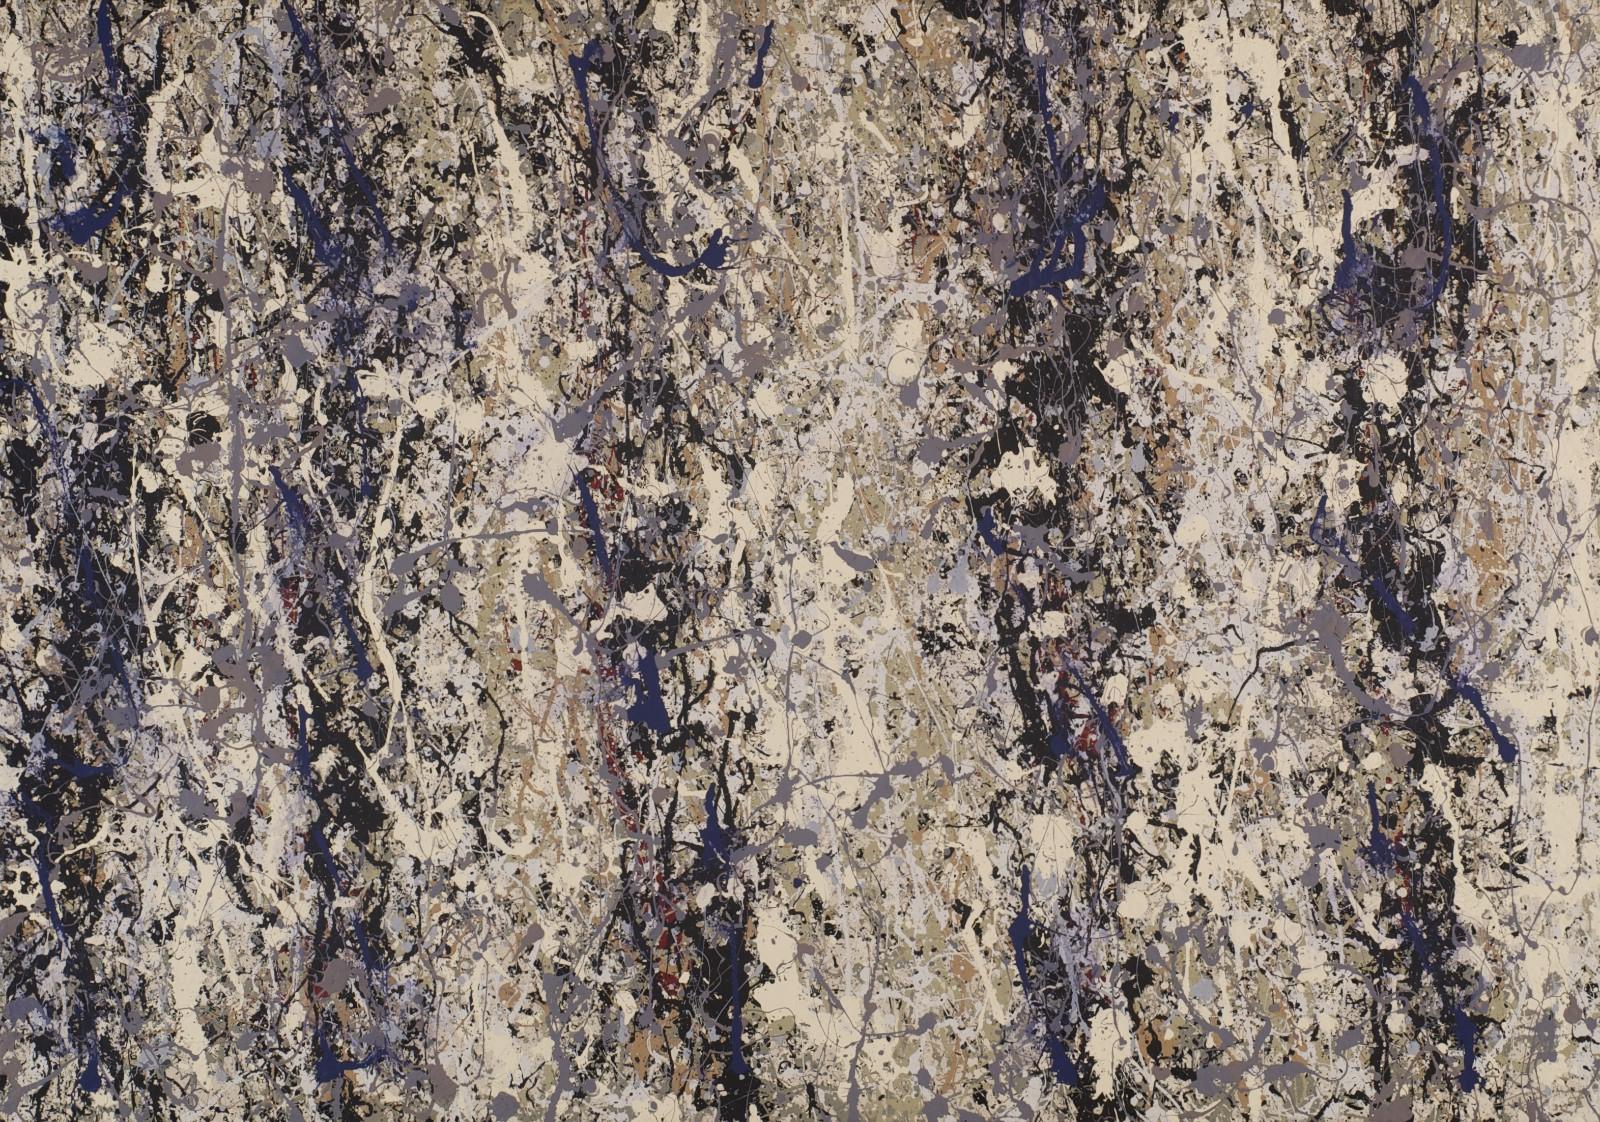 James Shand 'Winter III' 77cm x 110cm #14204